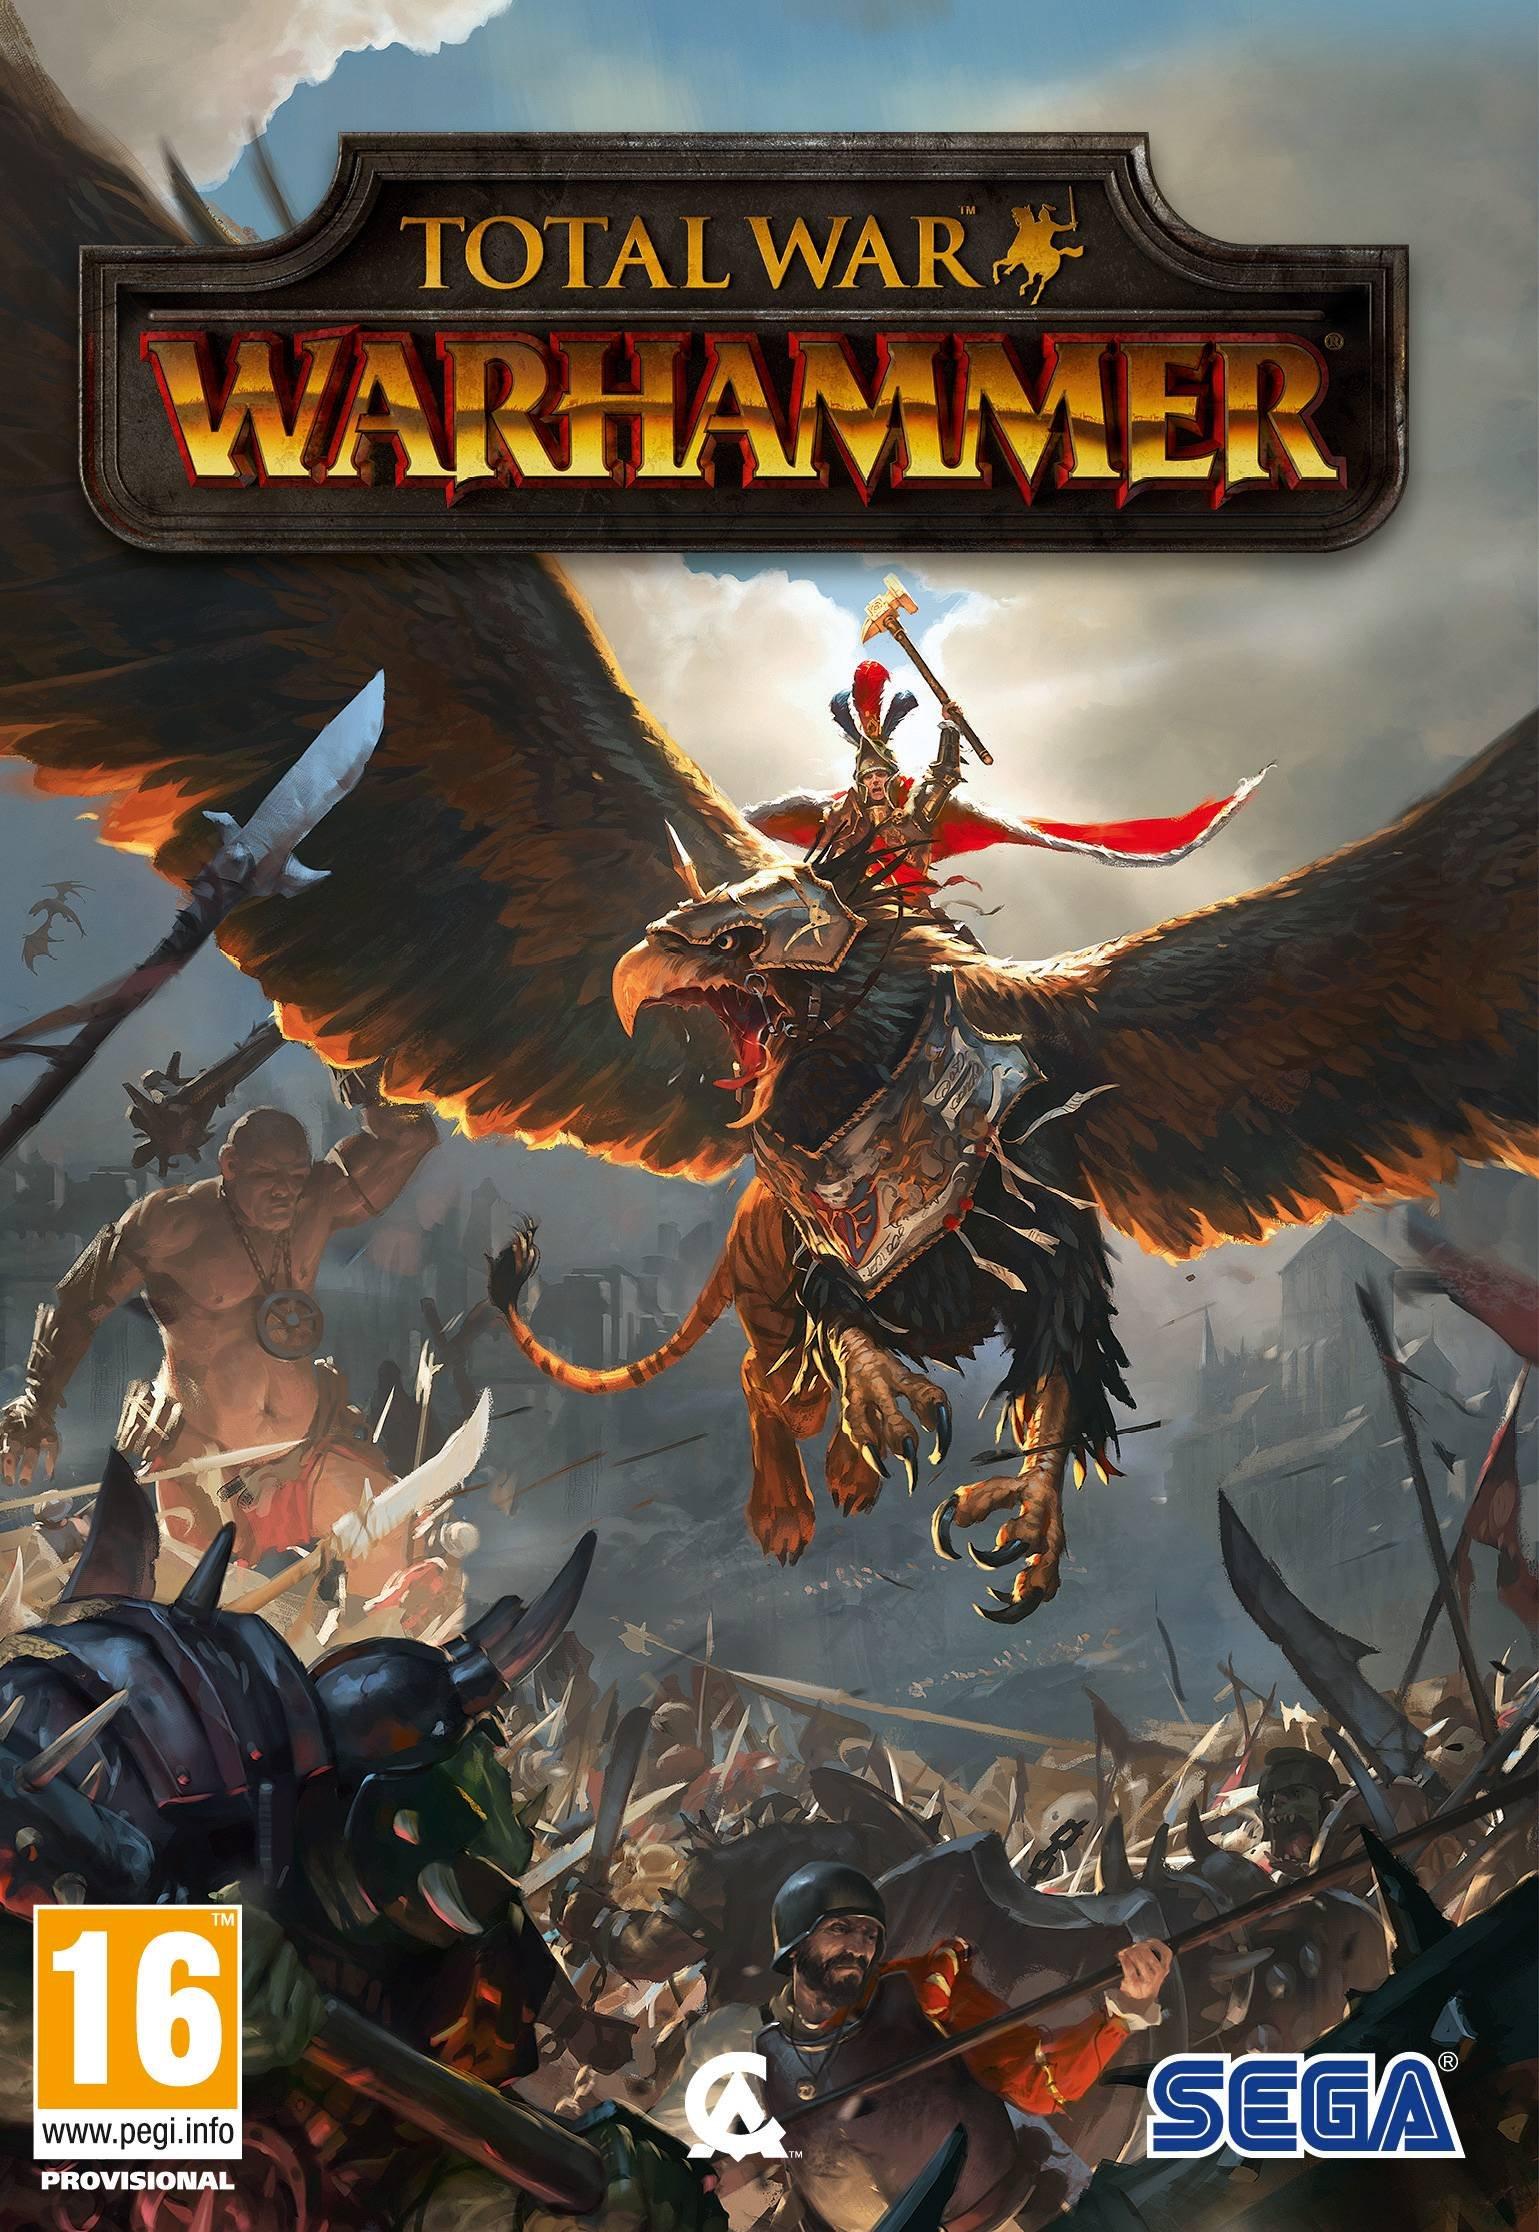 Total War: WARHAMMER (PC) Review 7